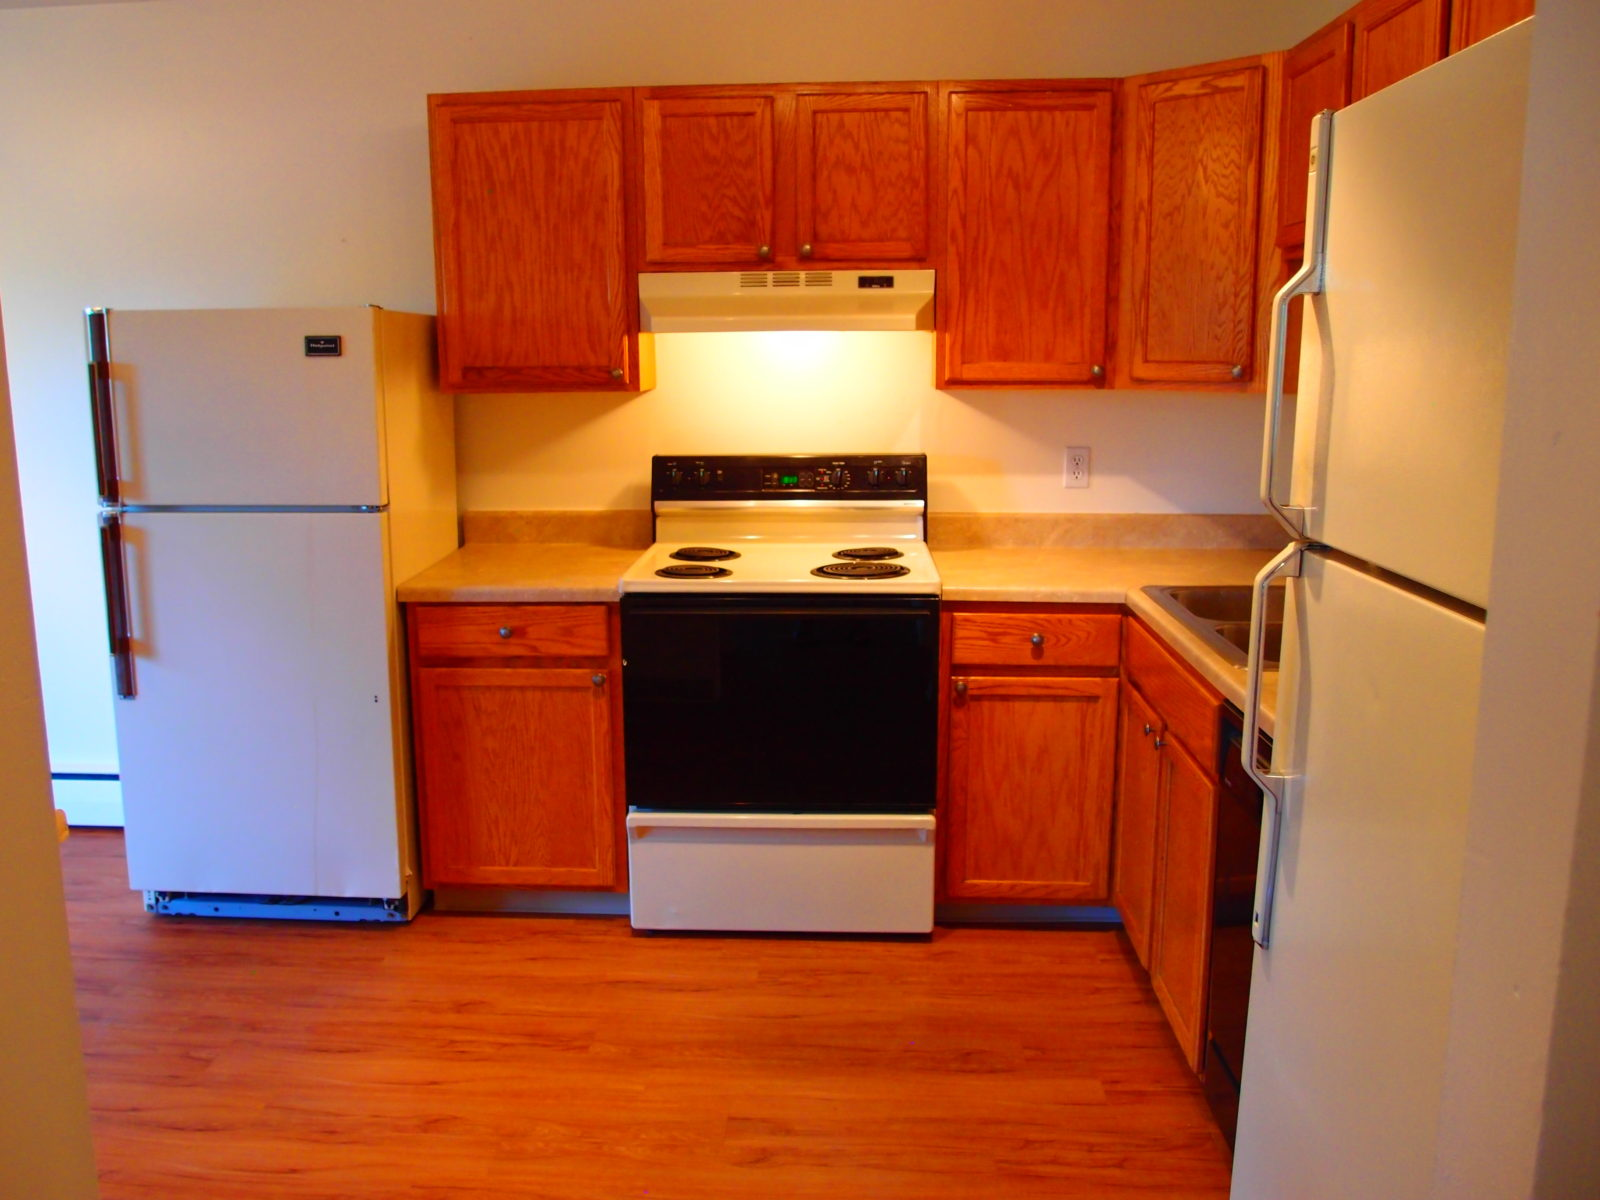 690 Kitchen Range